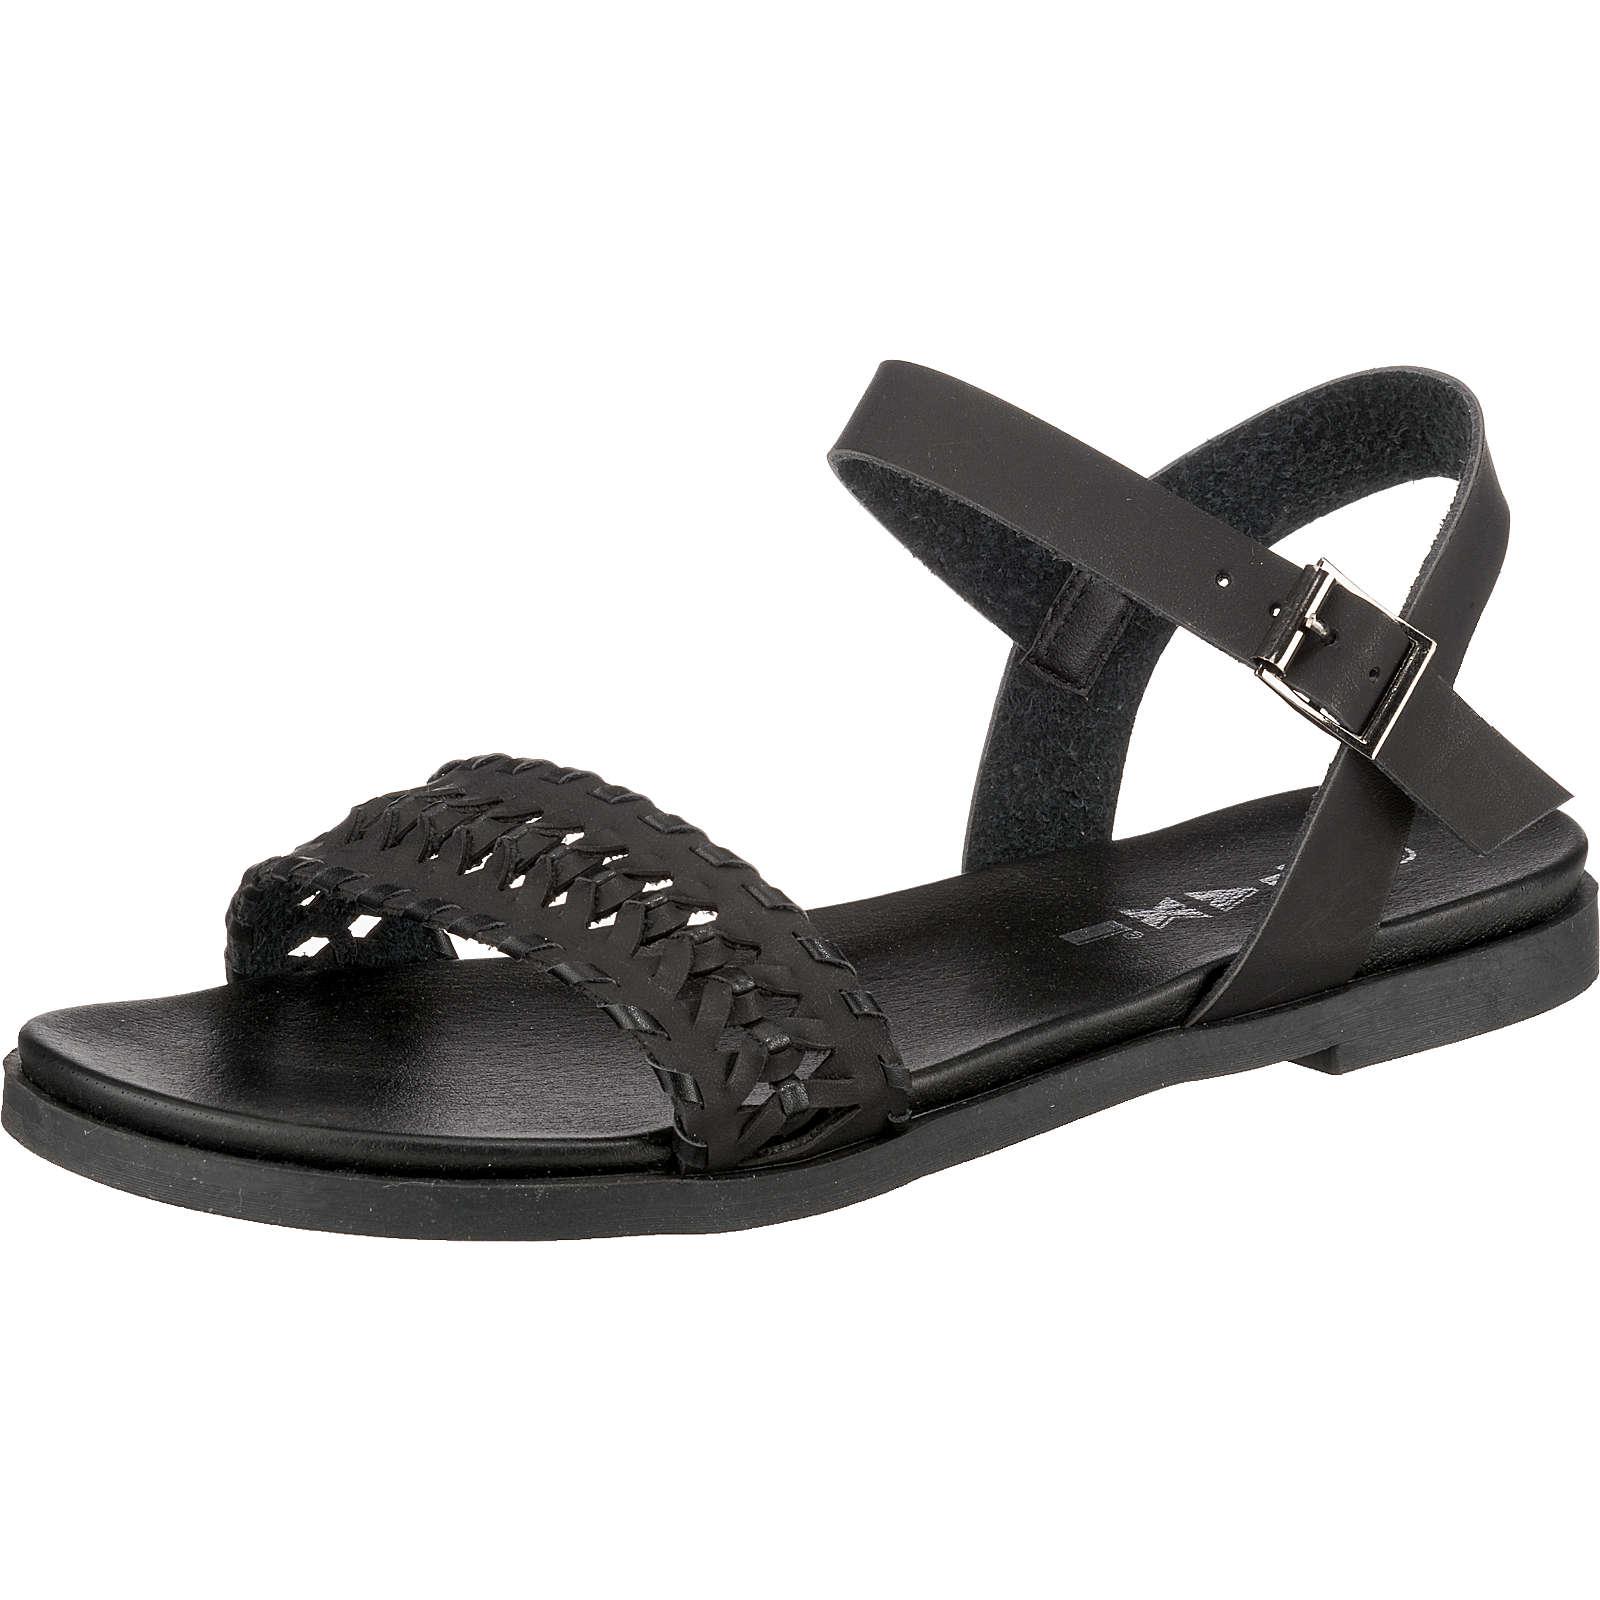 Taxi Shoes Klassische Sandalen schwarz Damen Gr. 36